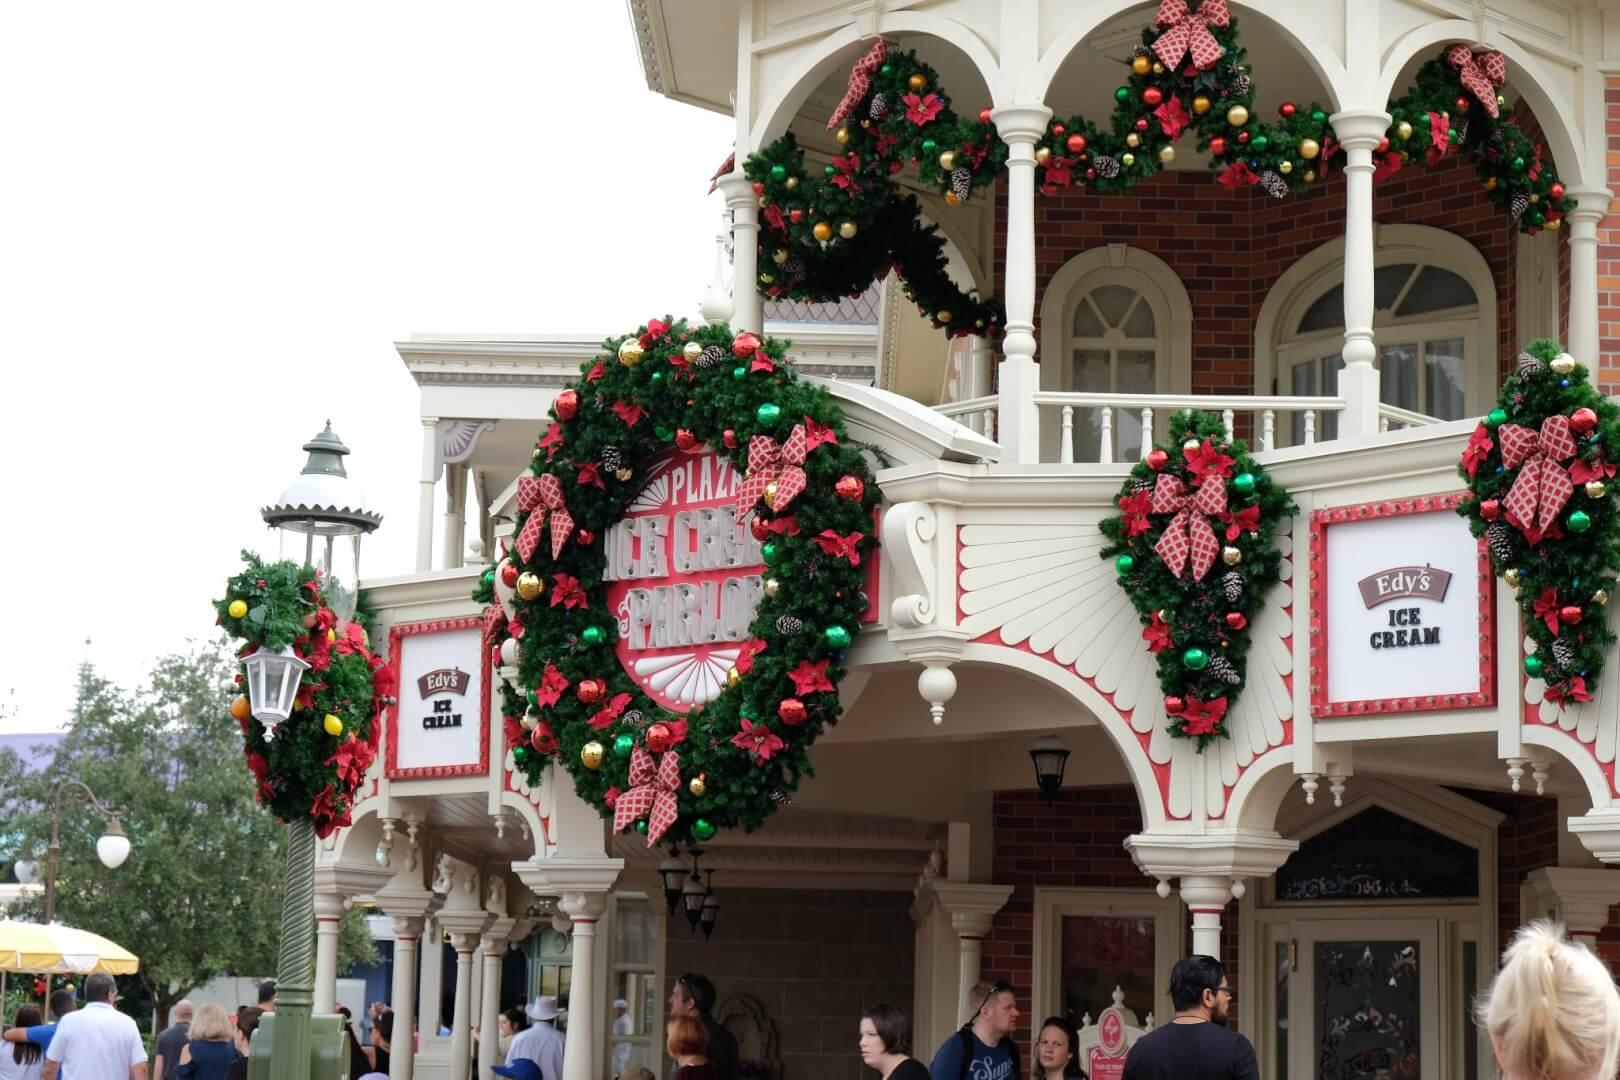 Christmas 2017 Decorations Arrive As Magic Kingdom Prepares For